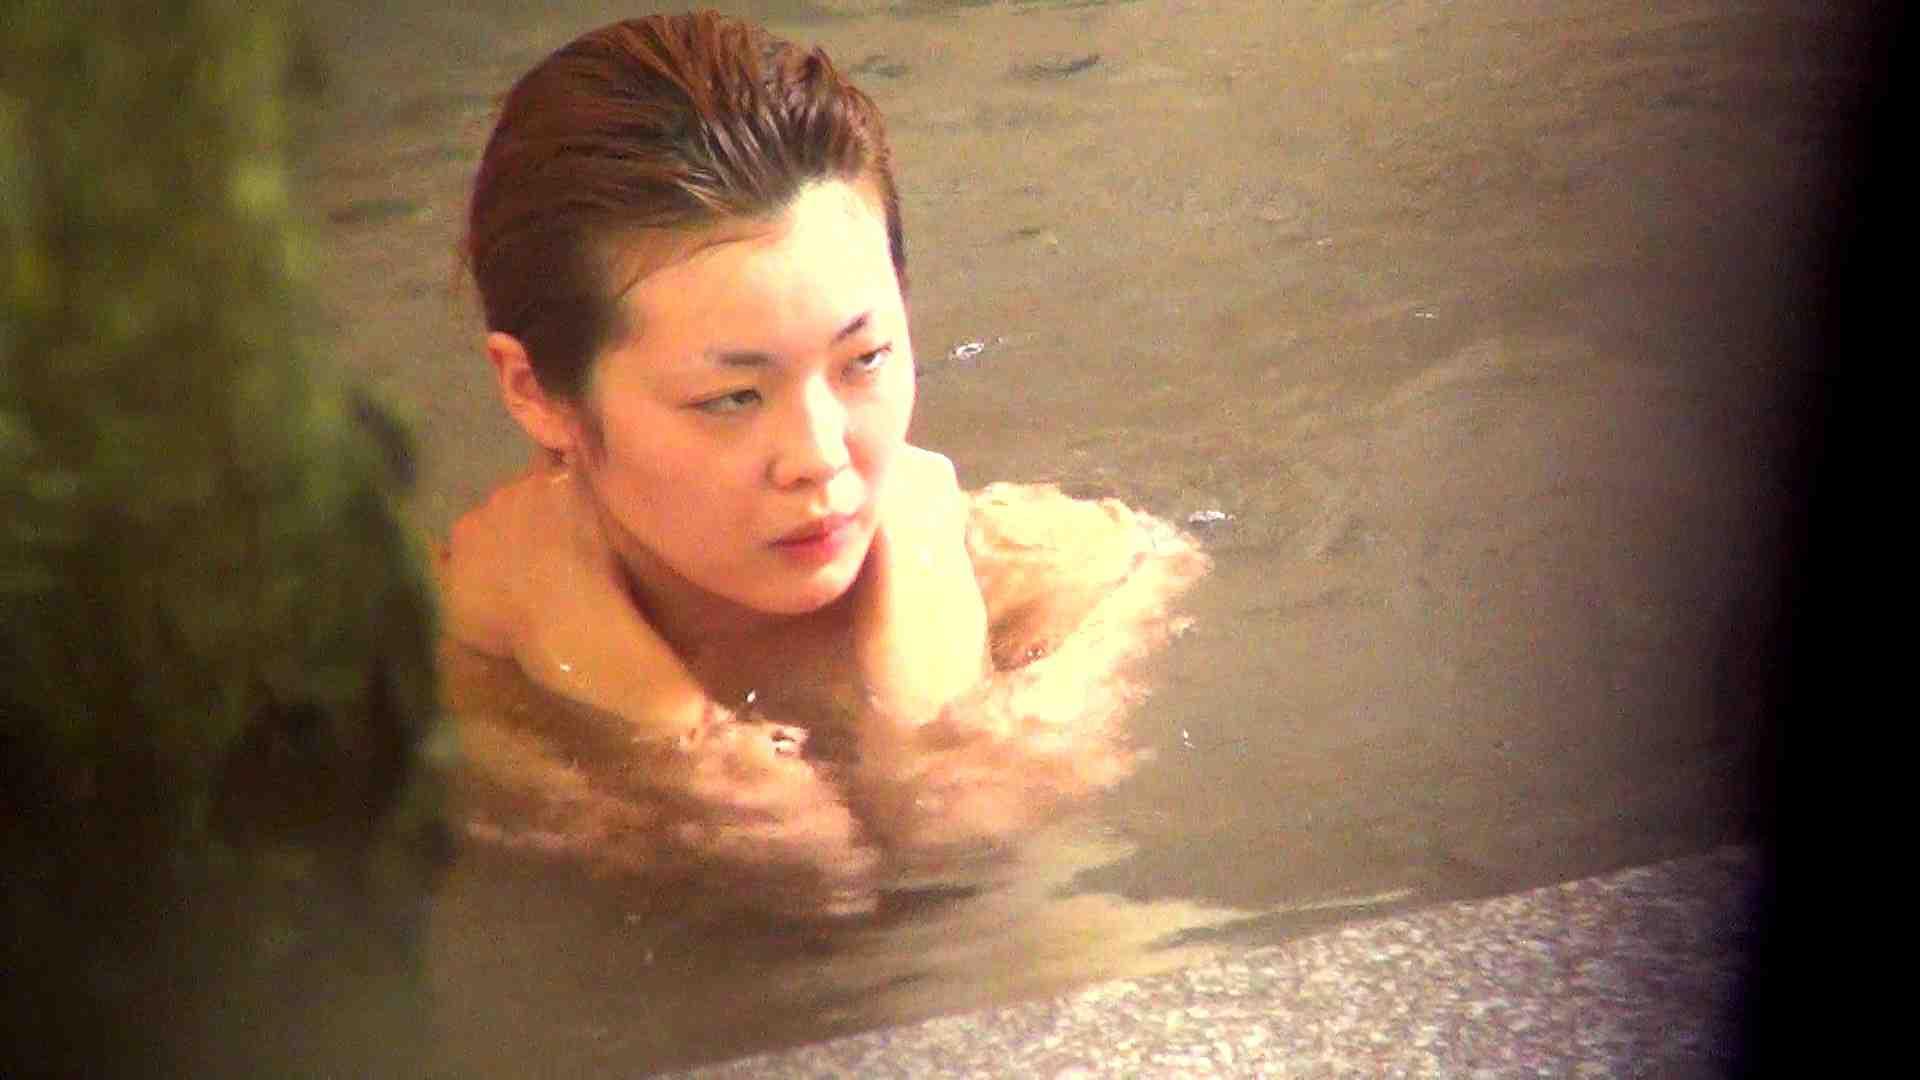 Aquaな露天風呂Vol.288 露天  85連発 81